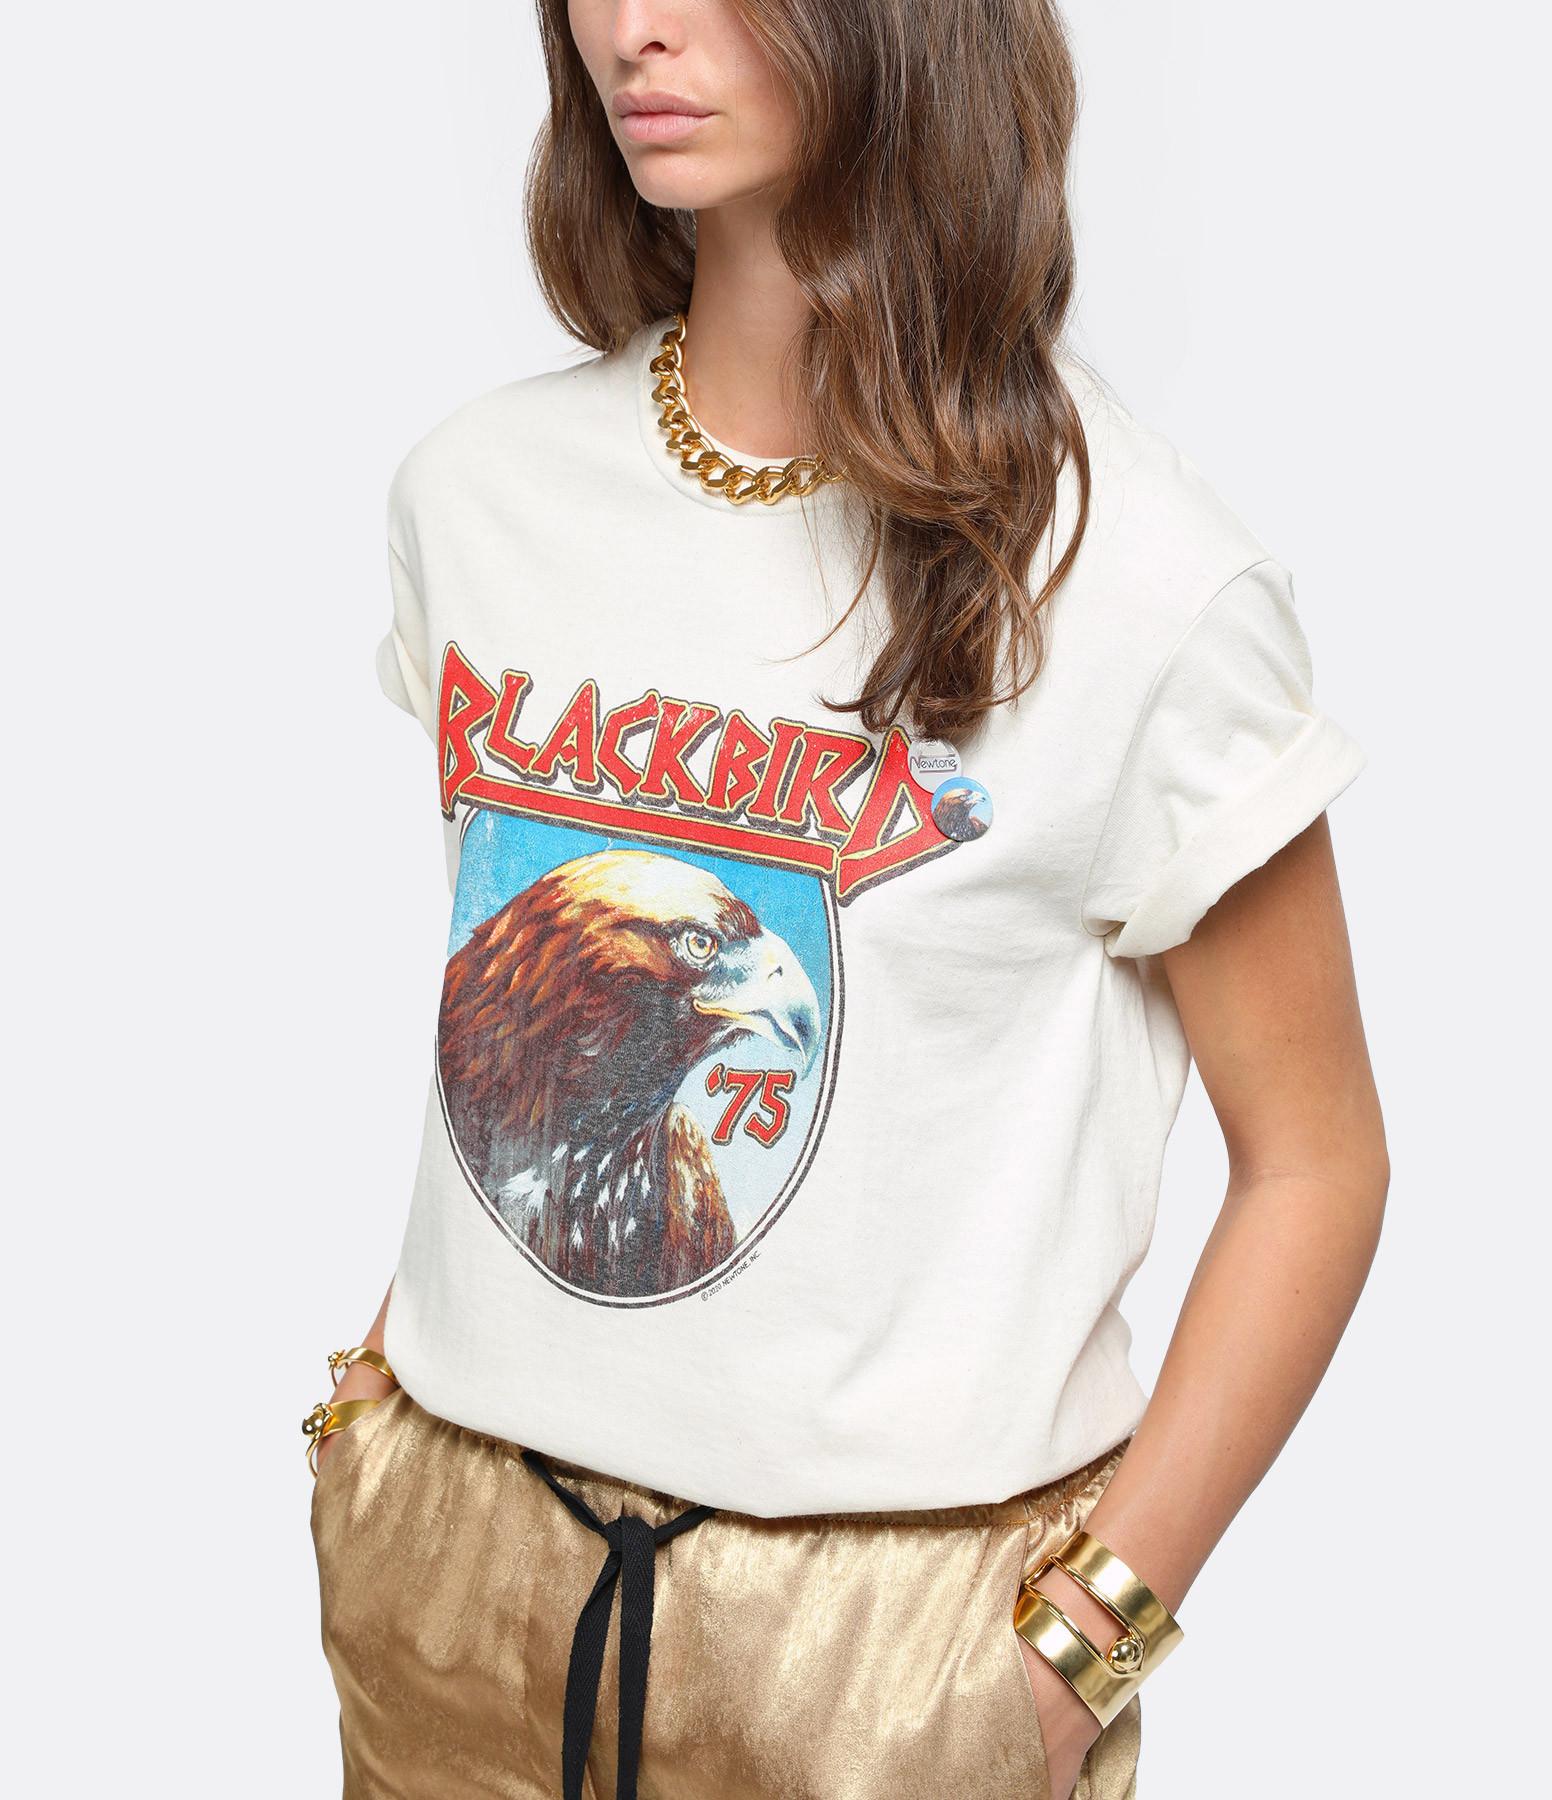 NEWTONE - Tee-shirt Blackbird Coton Naturel